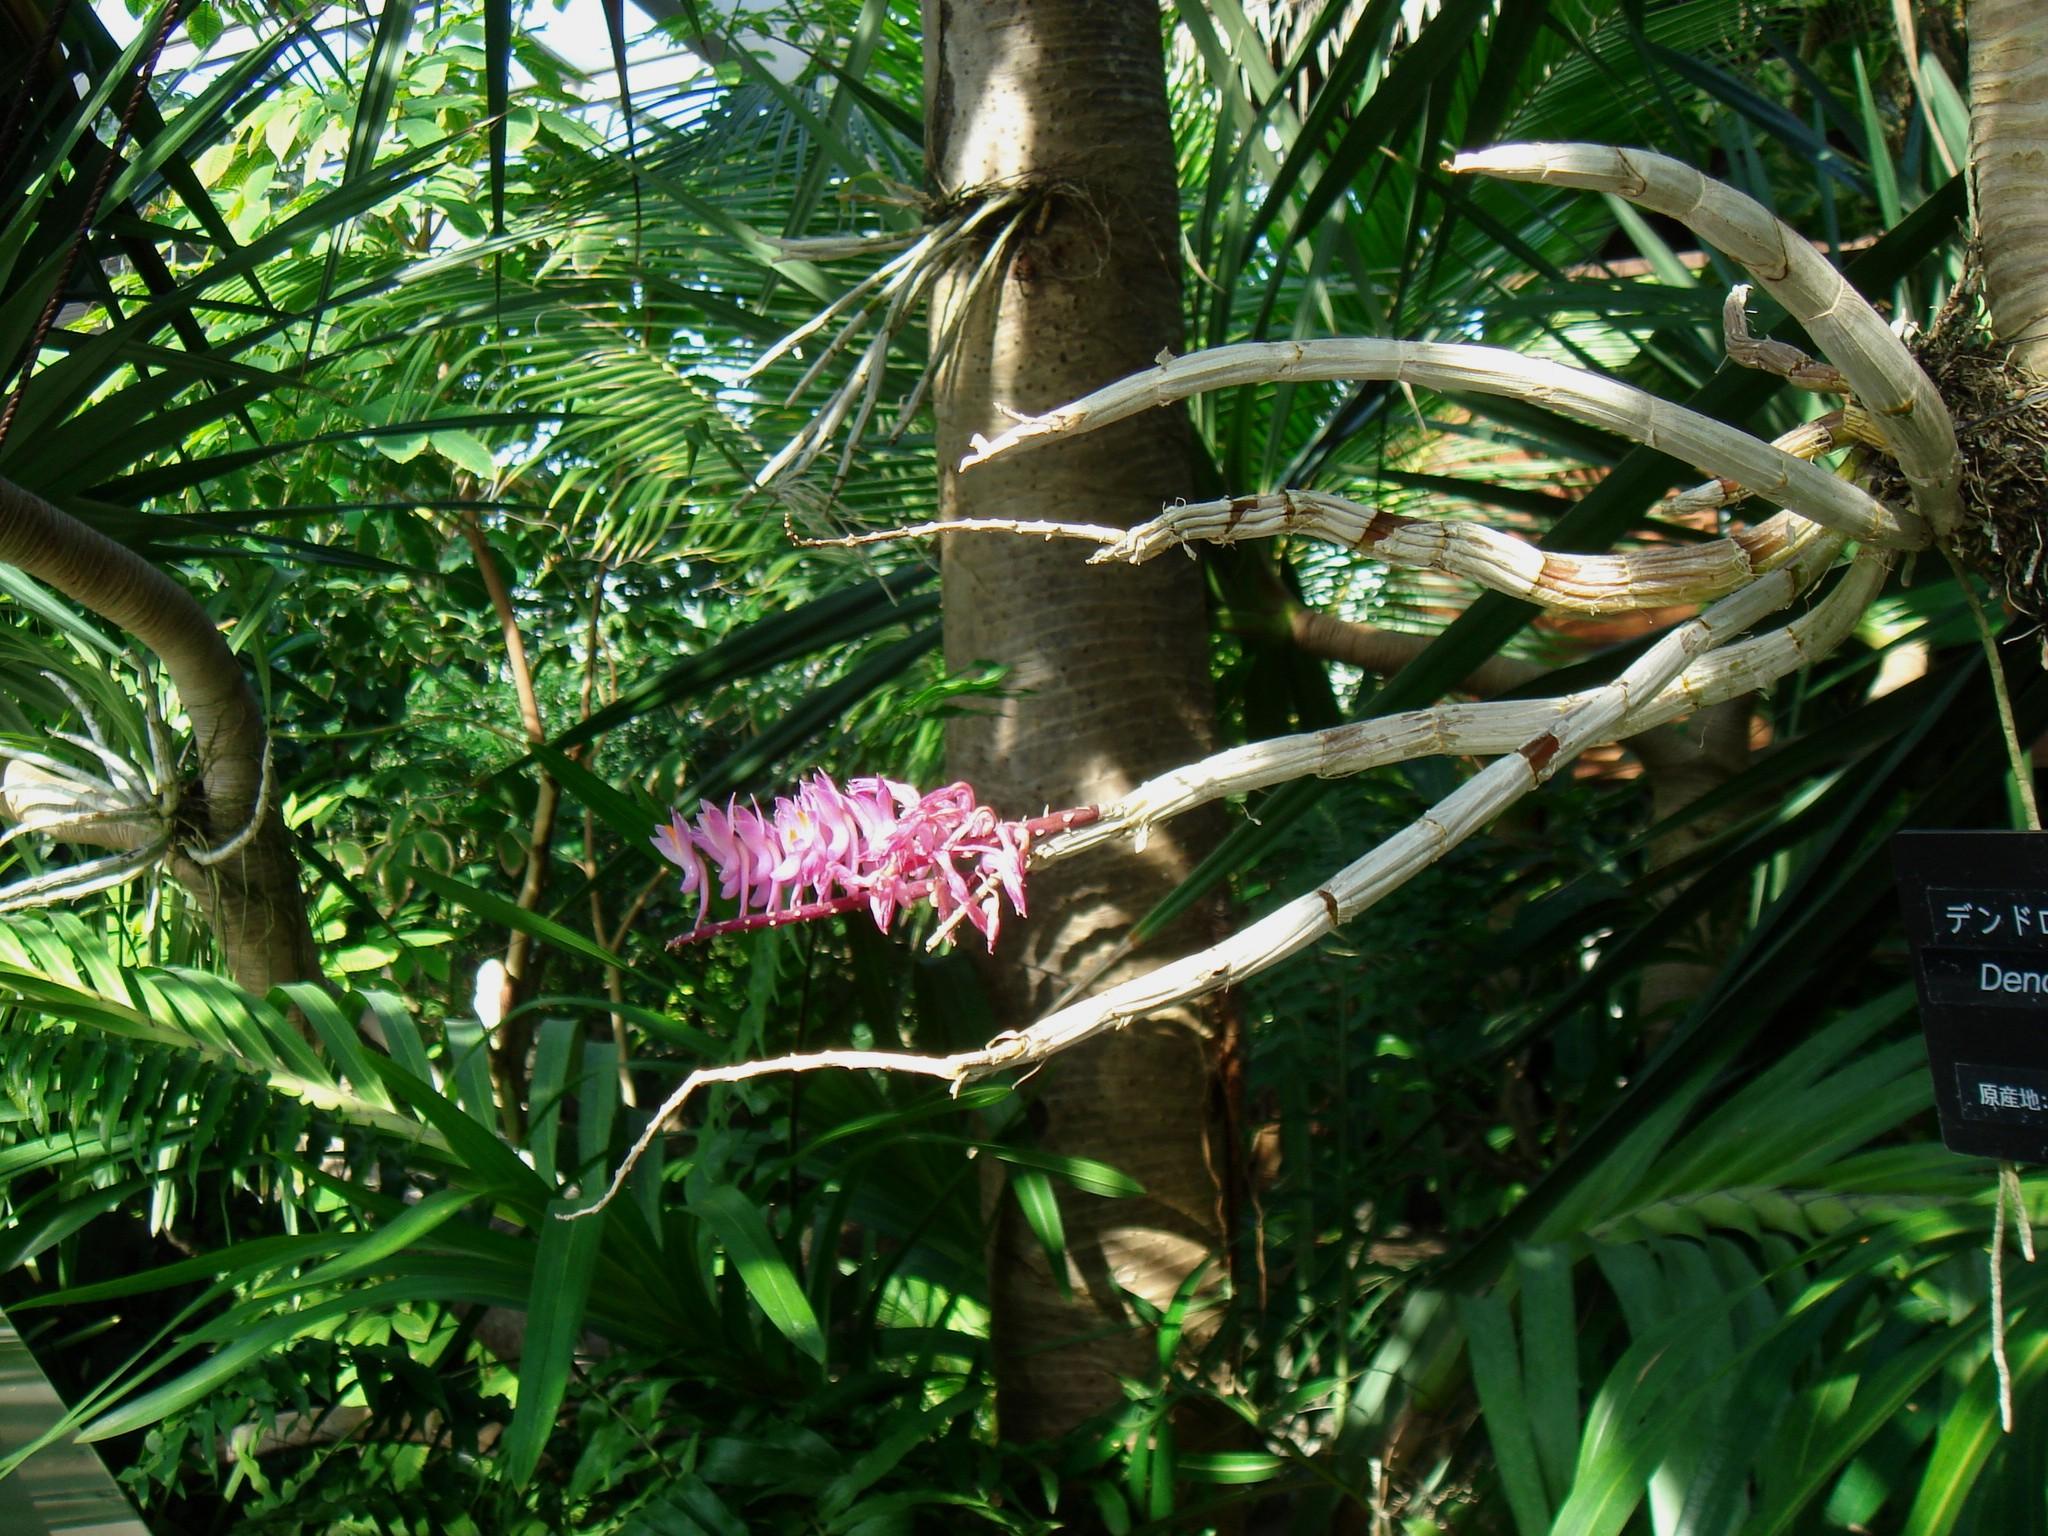 http://orchids.la.coocan.jp/Dendrobium/Dendrobium%20secundum/DSC09291.JPG